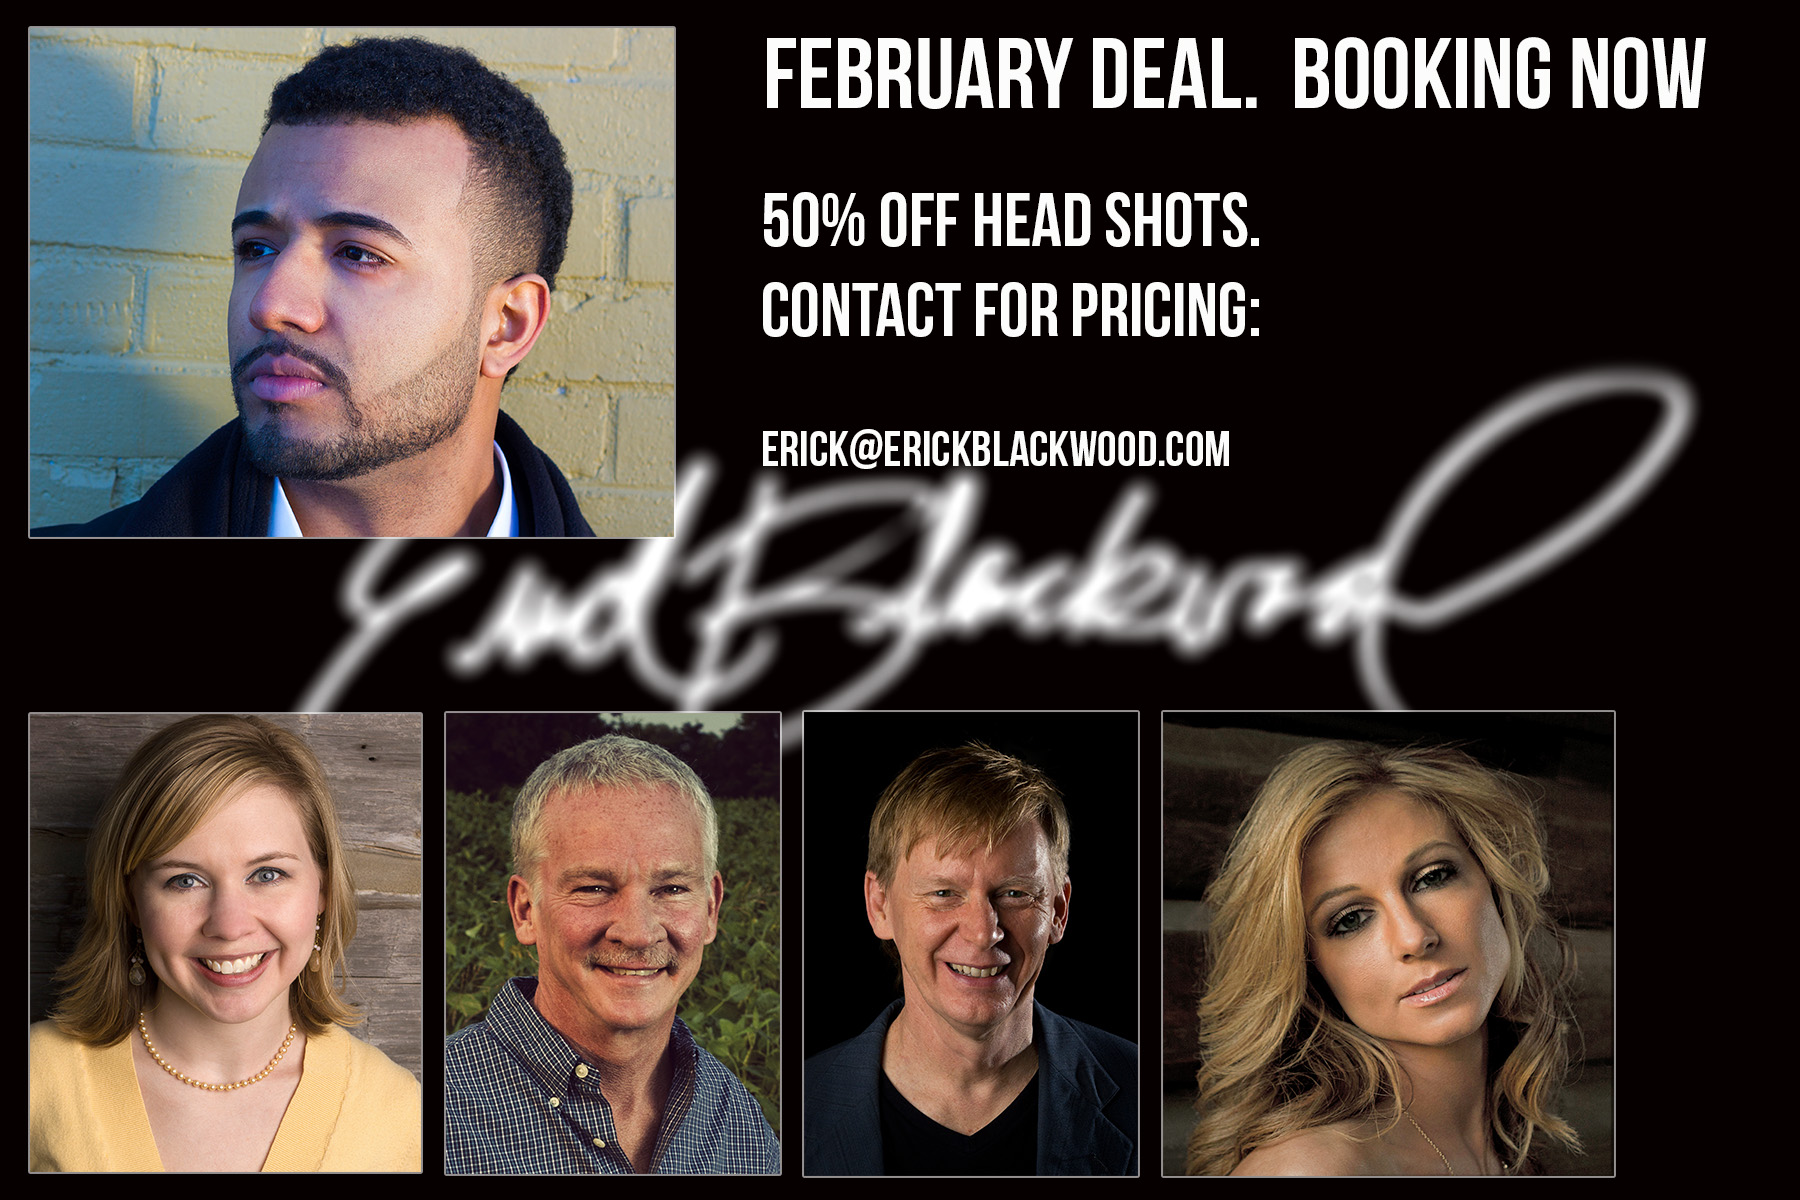 Head shot promo Feb 2014.jpg